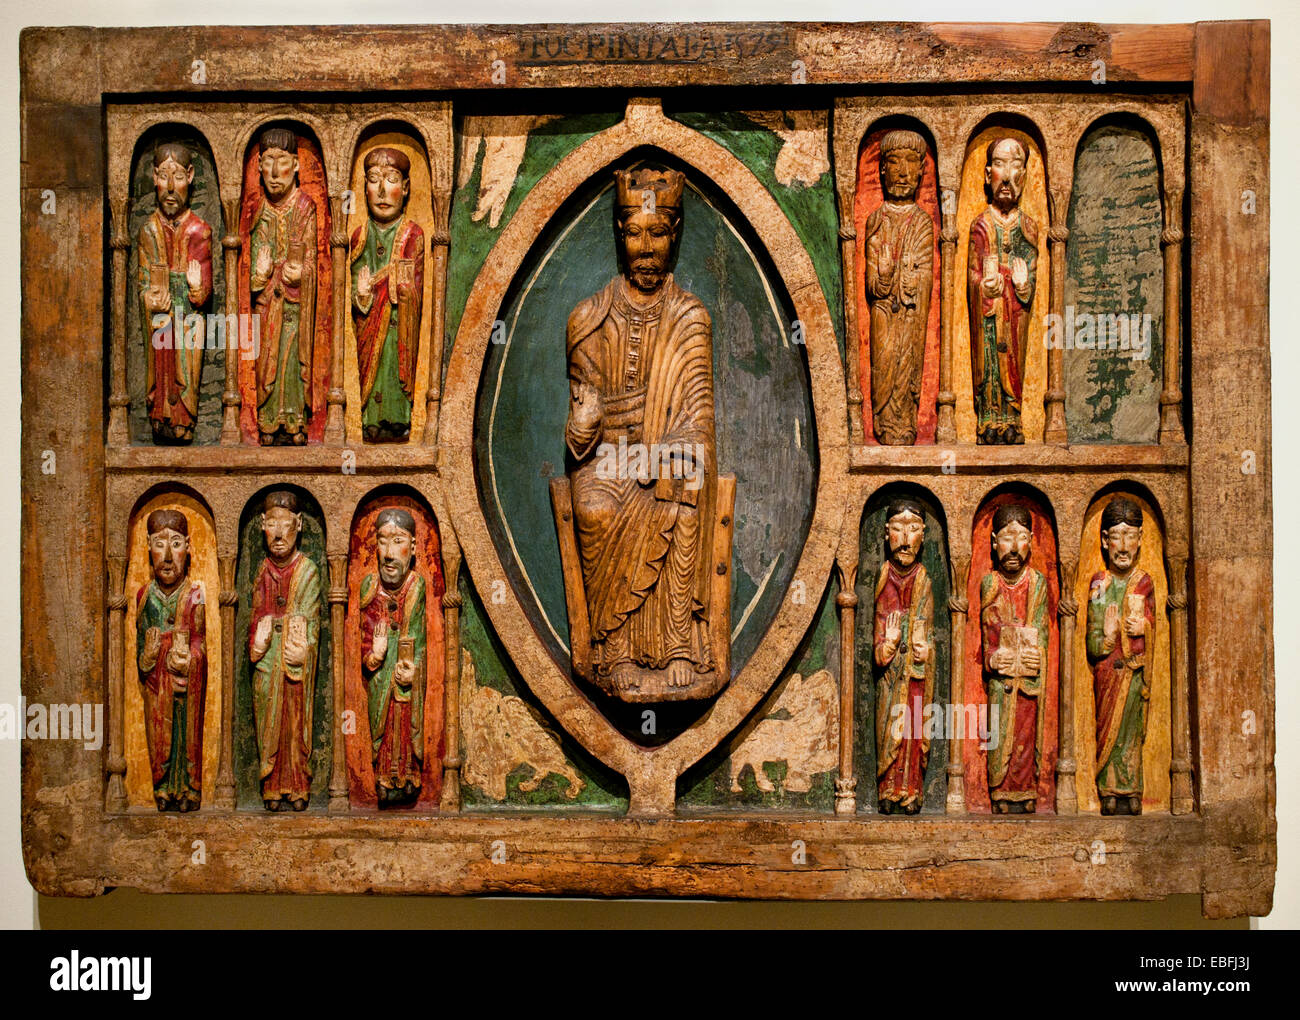 Altar frontal from Santa Maria de Taüll 1200 Medieval Romanesque  (La Vall de Boí, Alta Ribagorça). - Stock Image